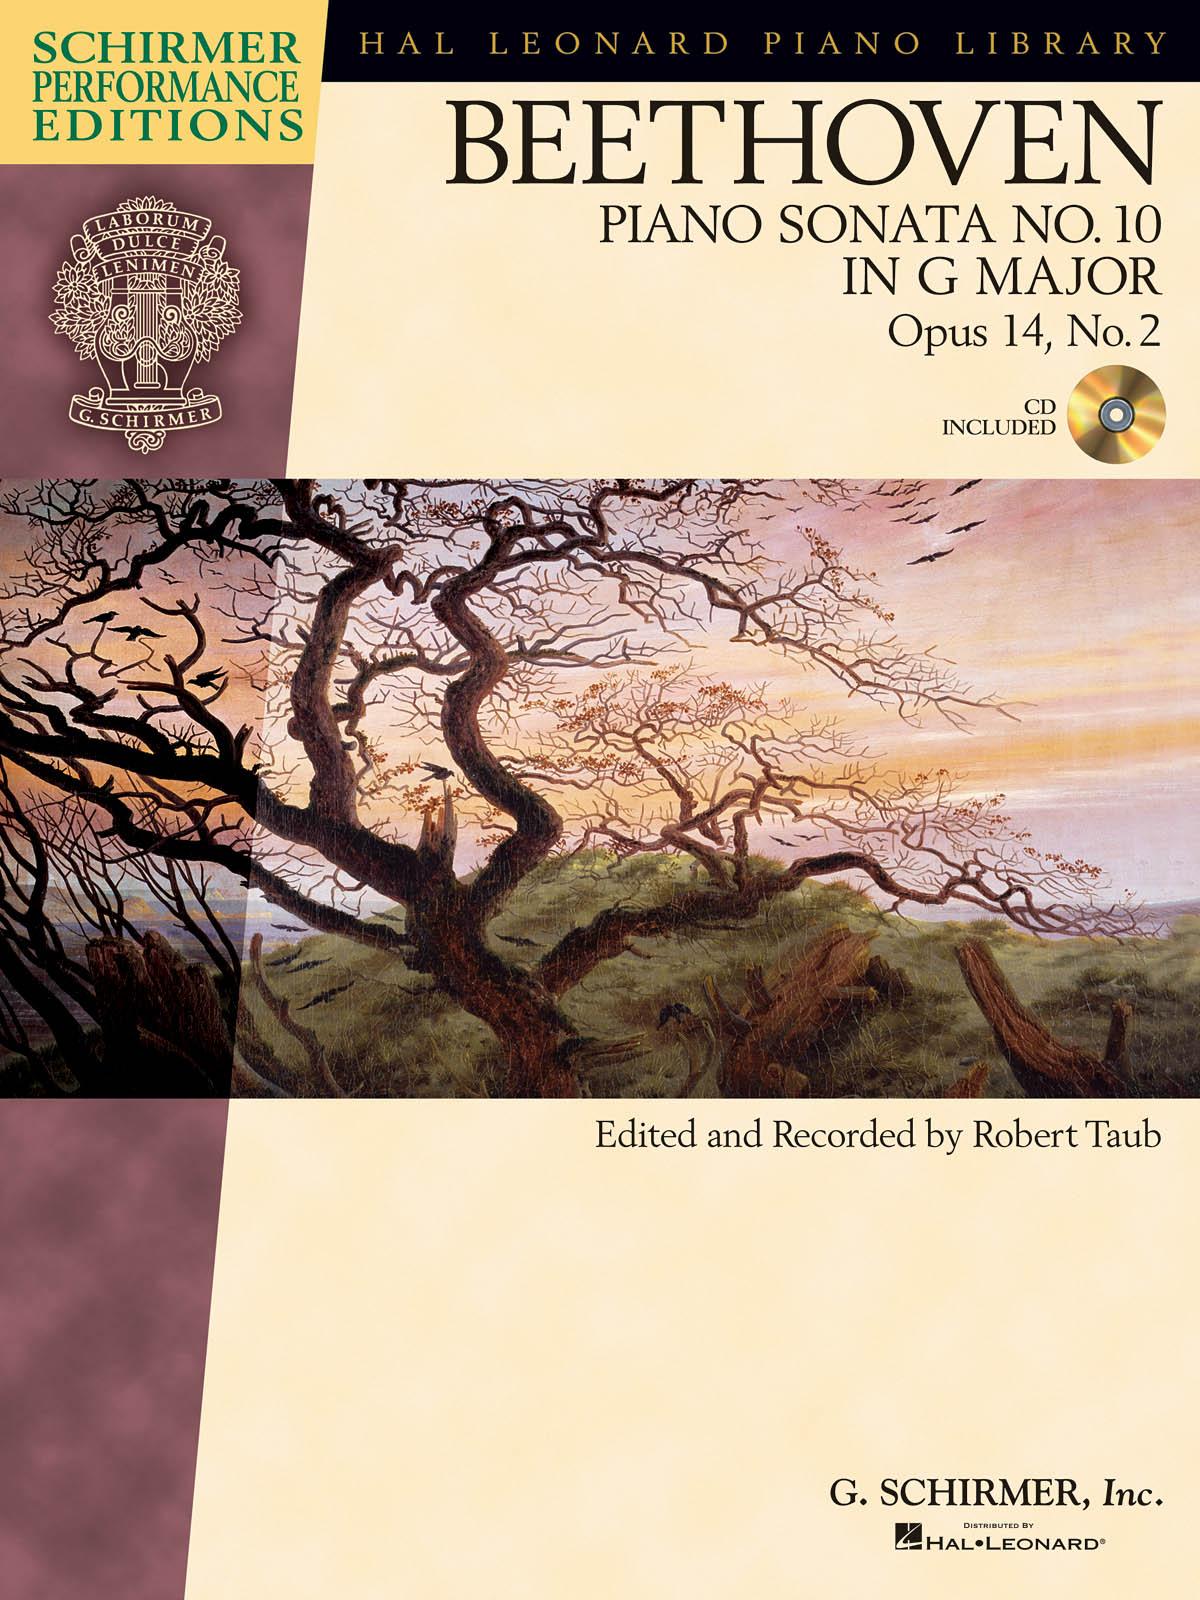 Ludwig Van Beethoven: Piano Sonata No.10 In G Op.14 No.2 (Schirmer Performance Edition) (Schirmer Performance Editions)